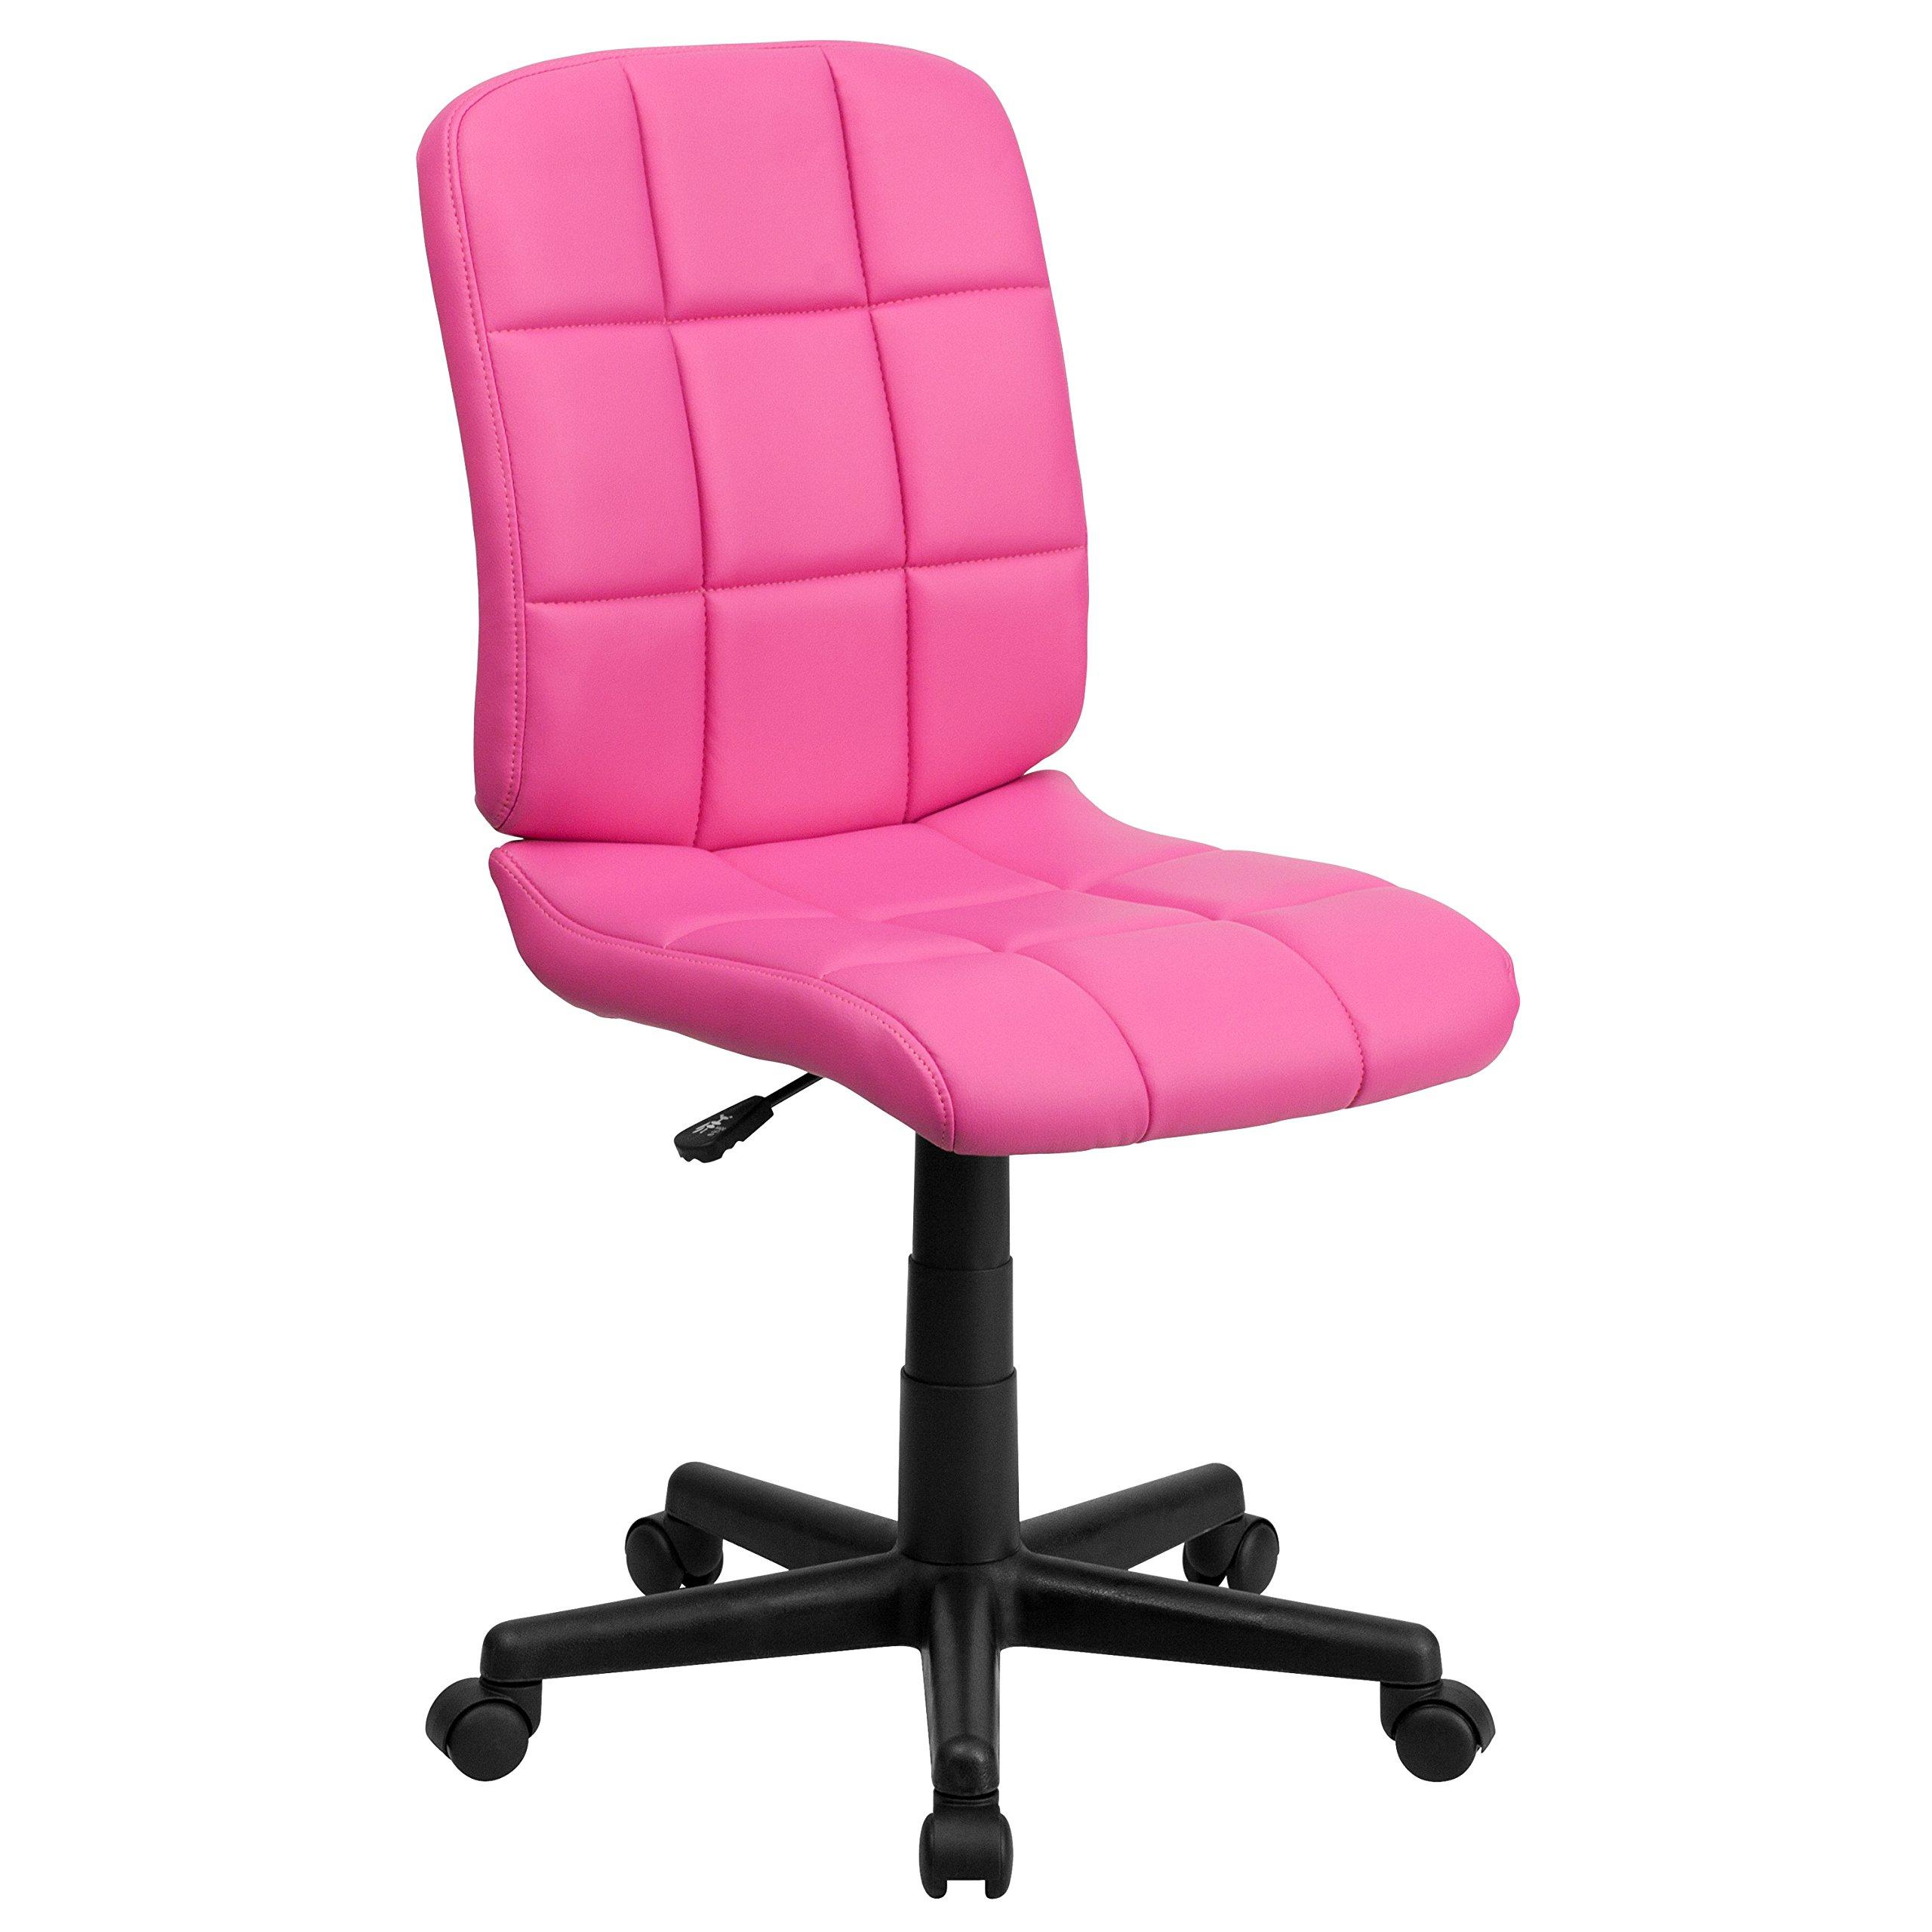 desk chair for teens amazon com rh amazon com Lounge Chairs for Girls Bedrooms Desk Chairs for Girls Bedroom